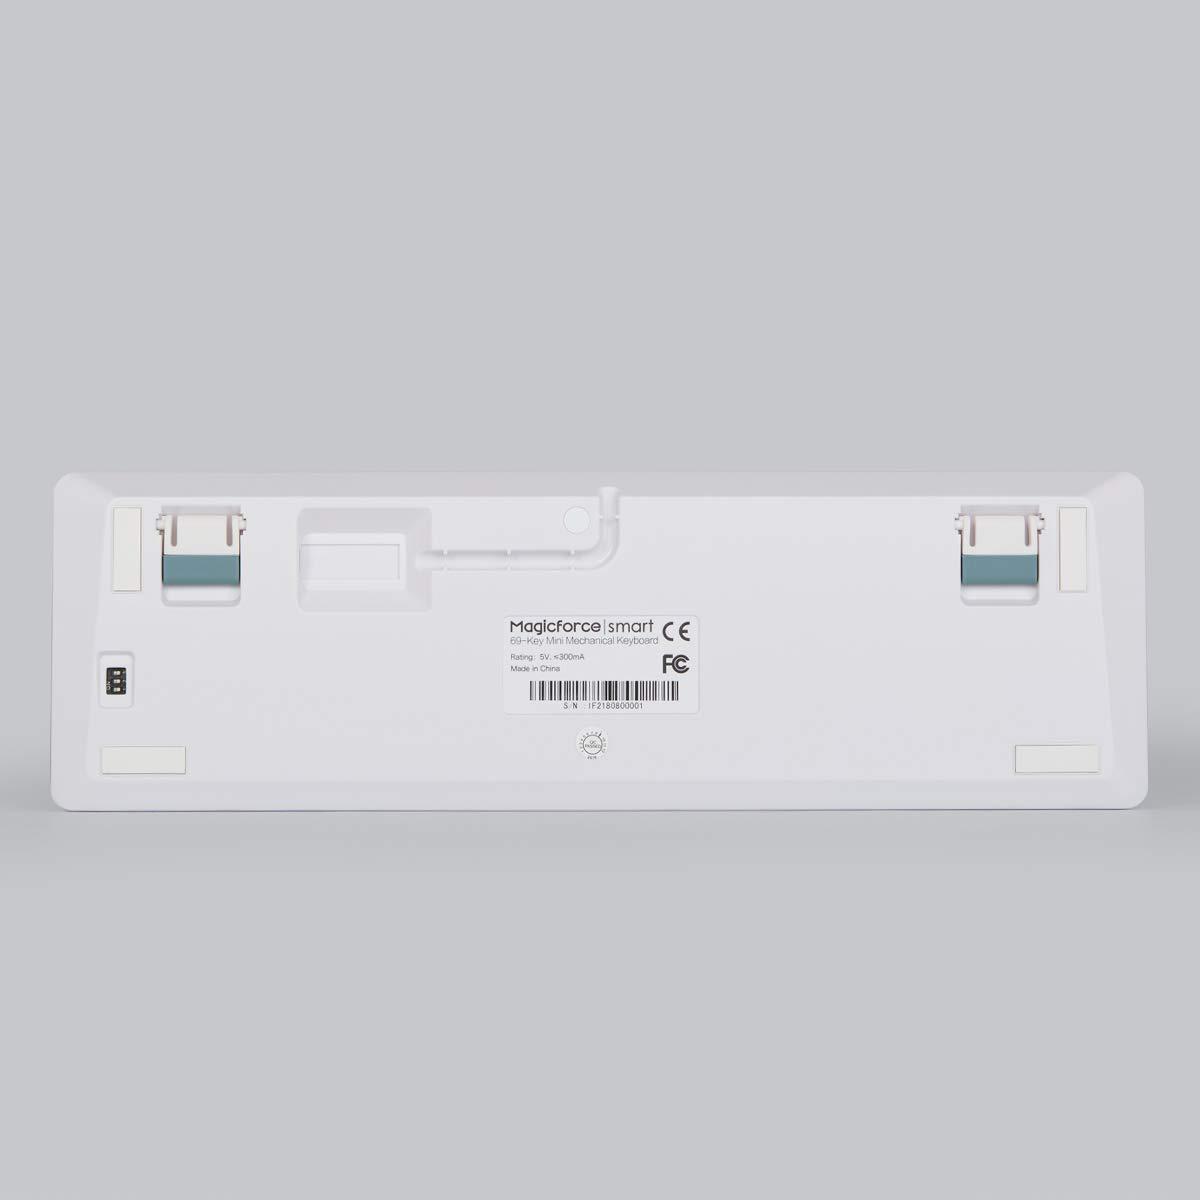 Qisan Wired Tastiera da Gioco Meccanica PBT Keycaps 69 Keys Gateron Brown Switch Bianco retroilluminato ES QWERTY Layout Gaming Keyboard-White